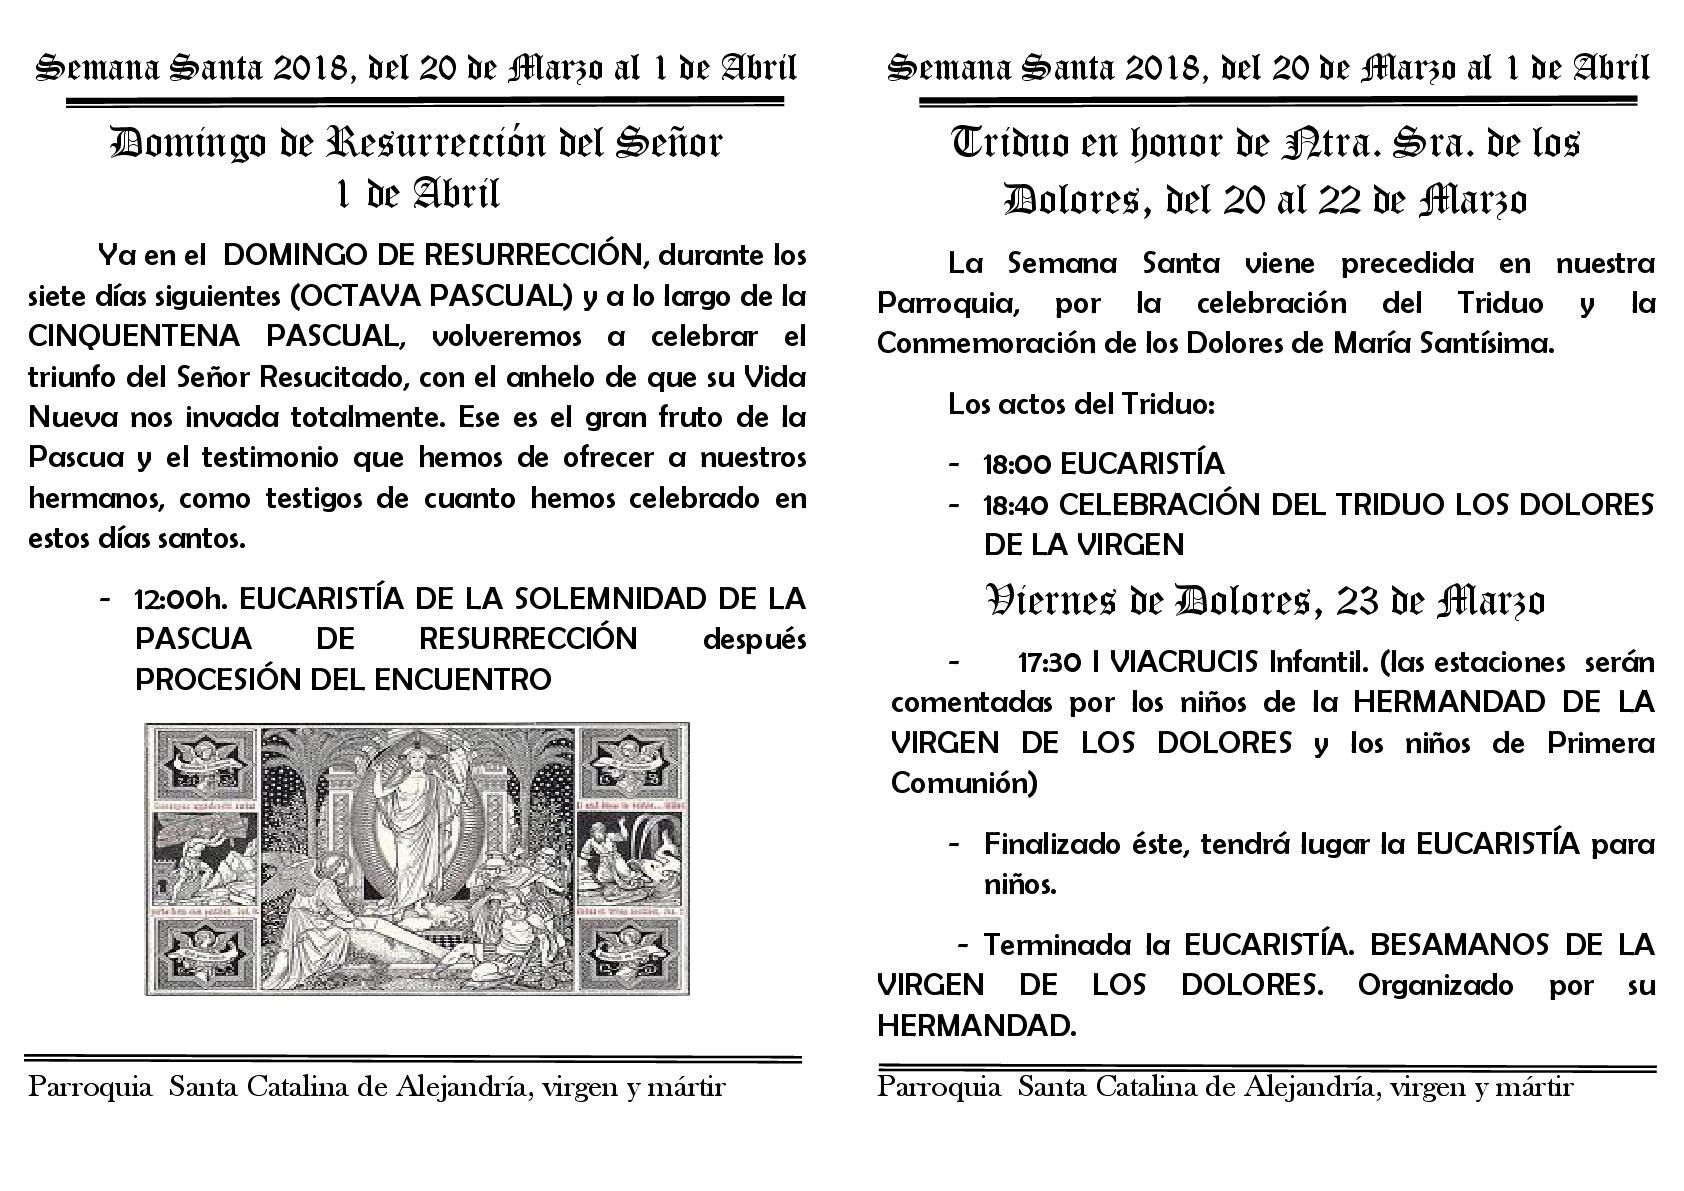 Semana Santa 2018 programa del domingo de resurreccion